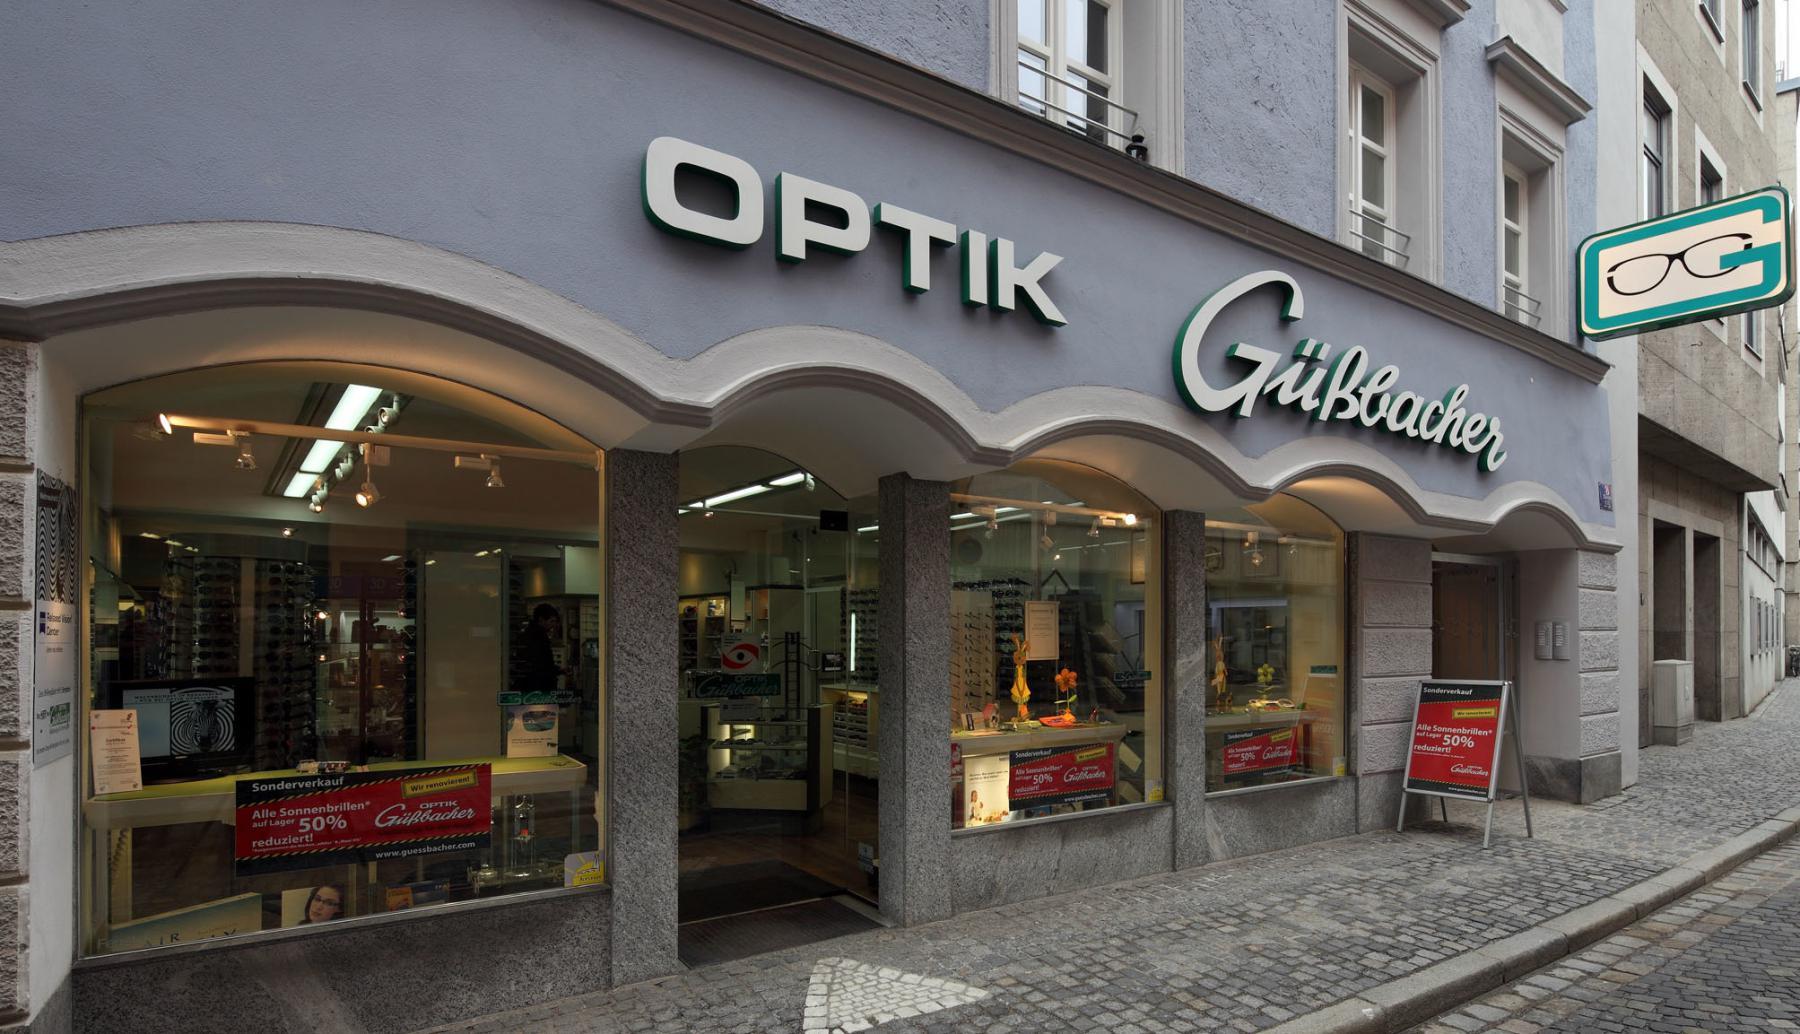 switch it bei optik g bacher gmbh in regensburg. Black Bedroom Furniture Sets. Home Design Ideas